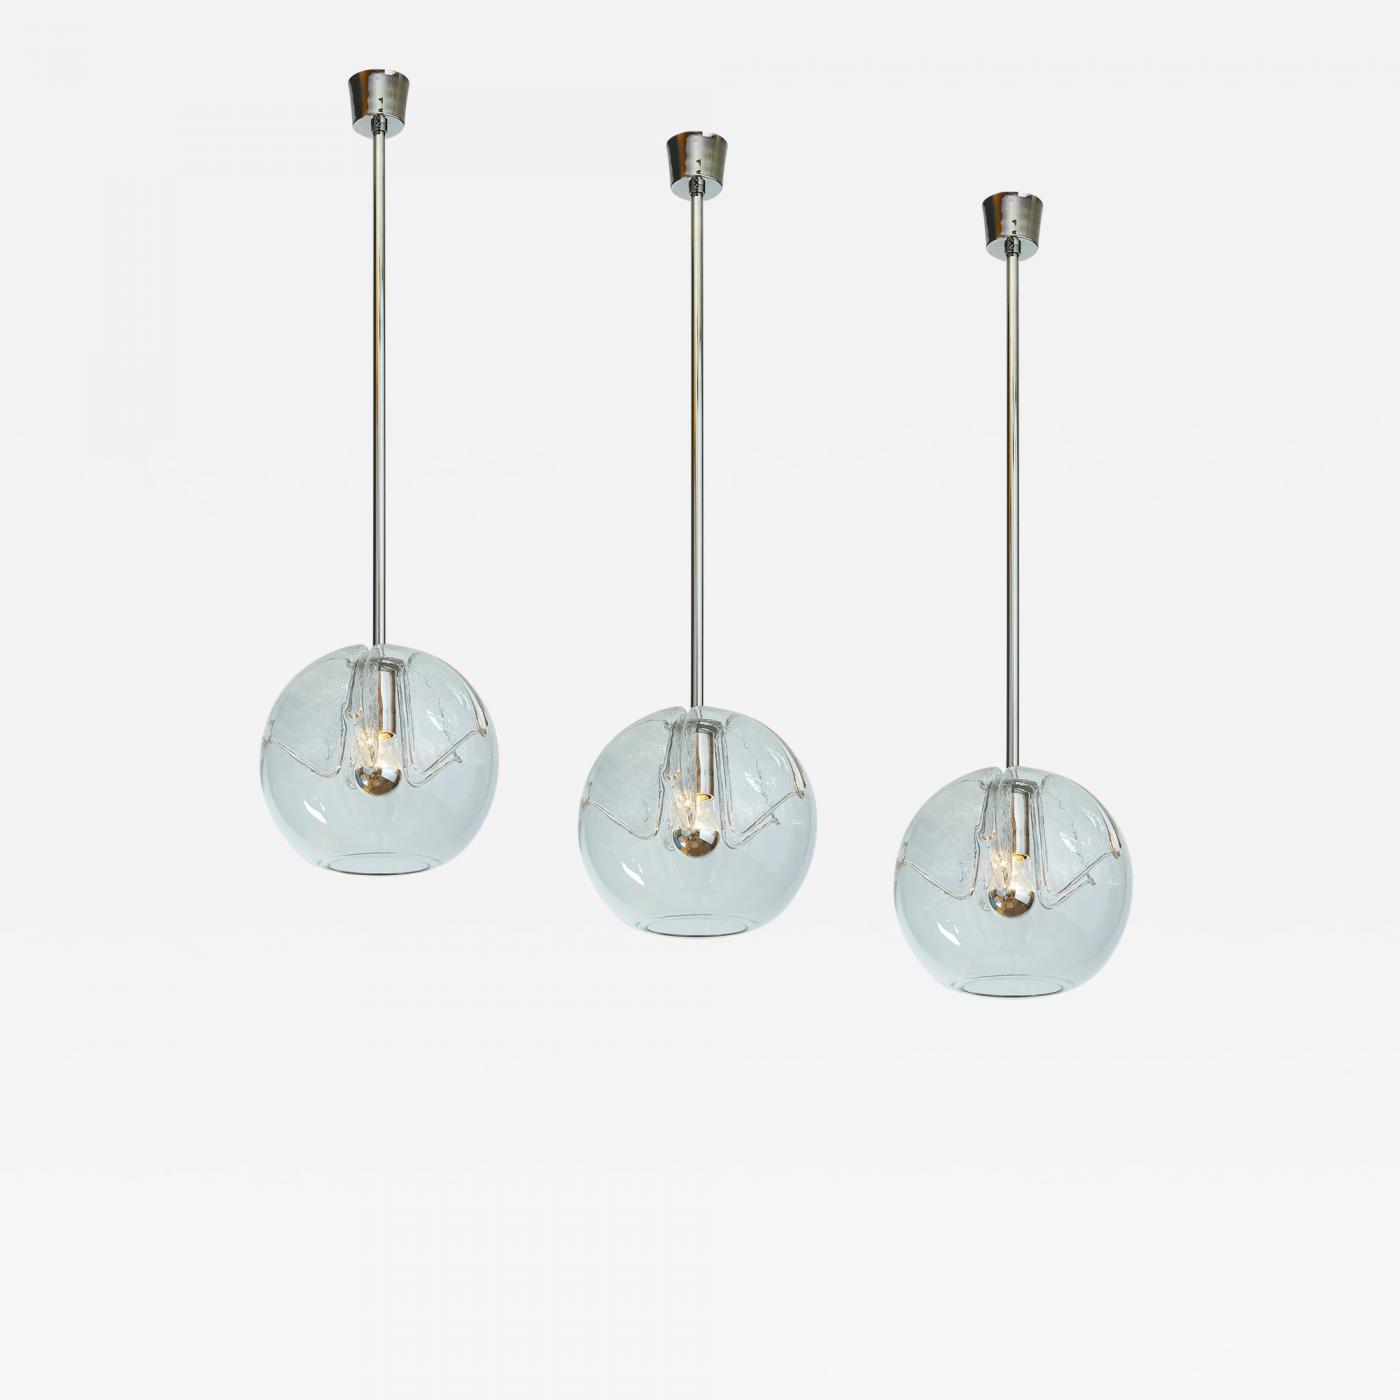 Set of Twelve Blown Glass Clear Pendant Lanterns